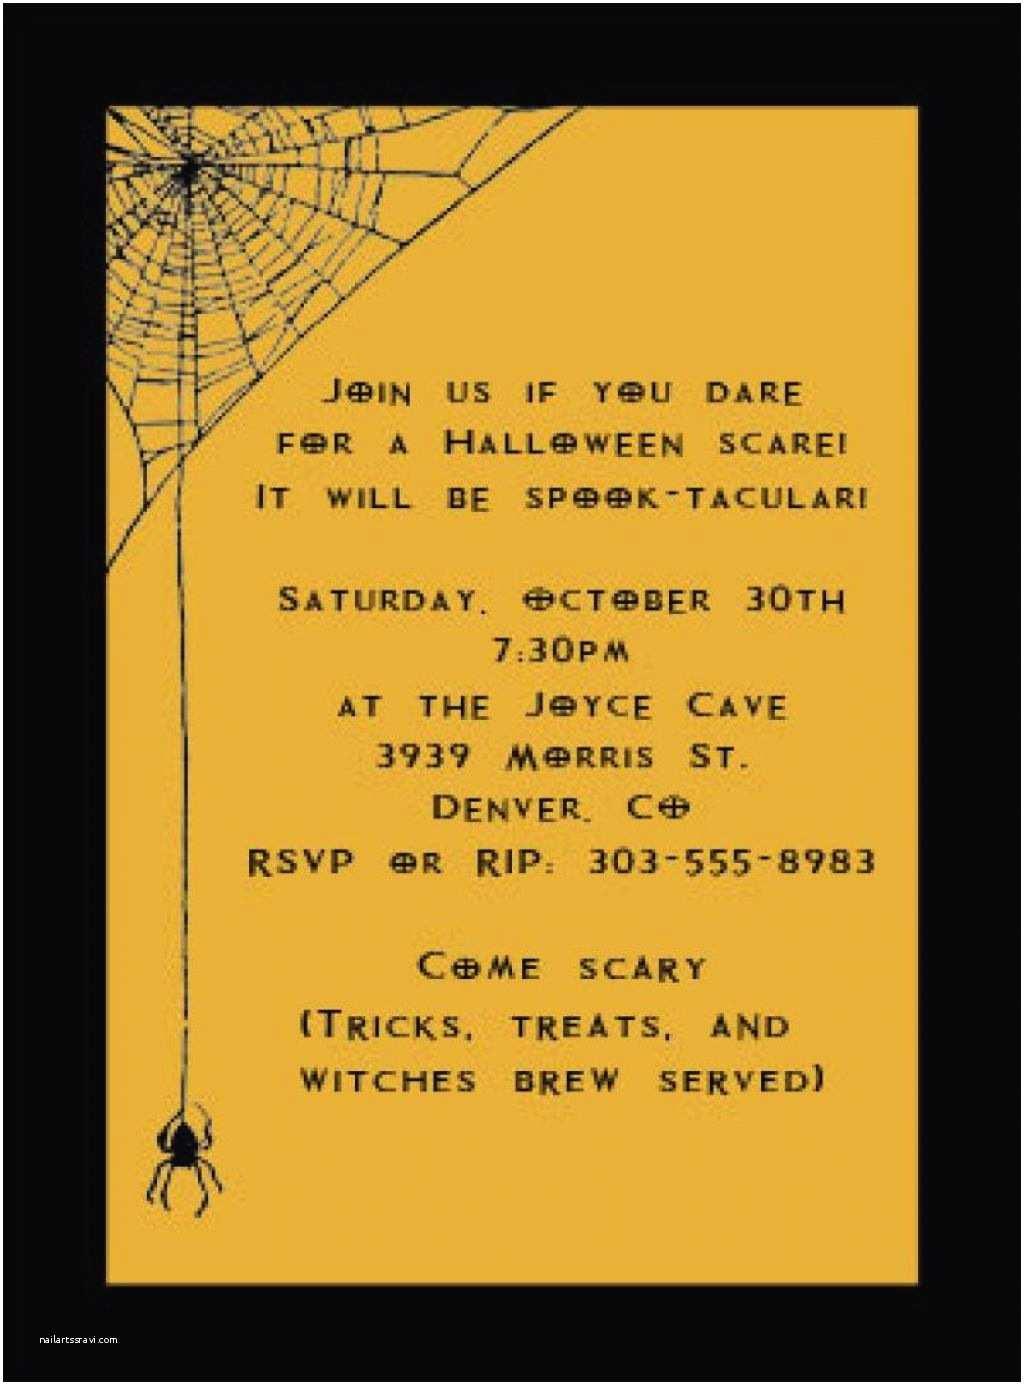 Costume Party Invitation Wording Halloween Party Invitation Wording –